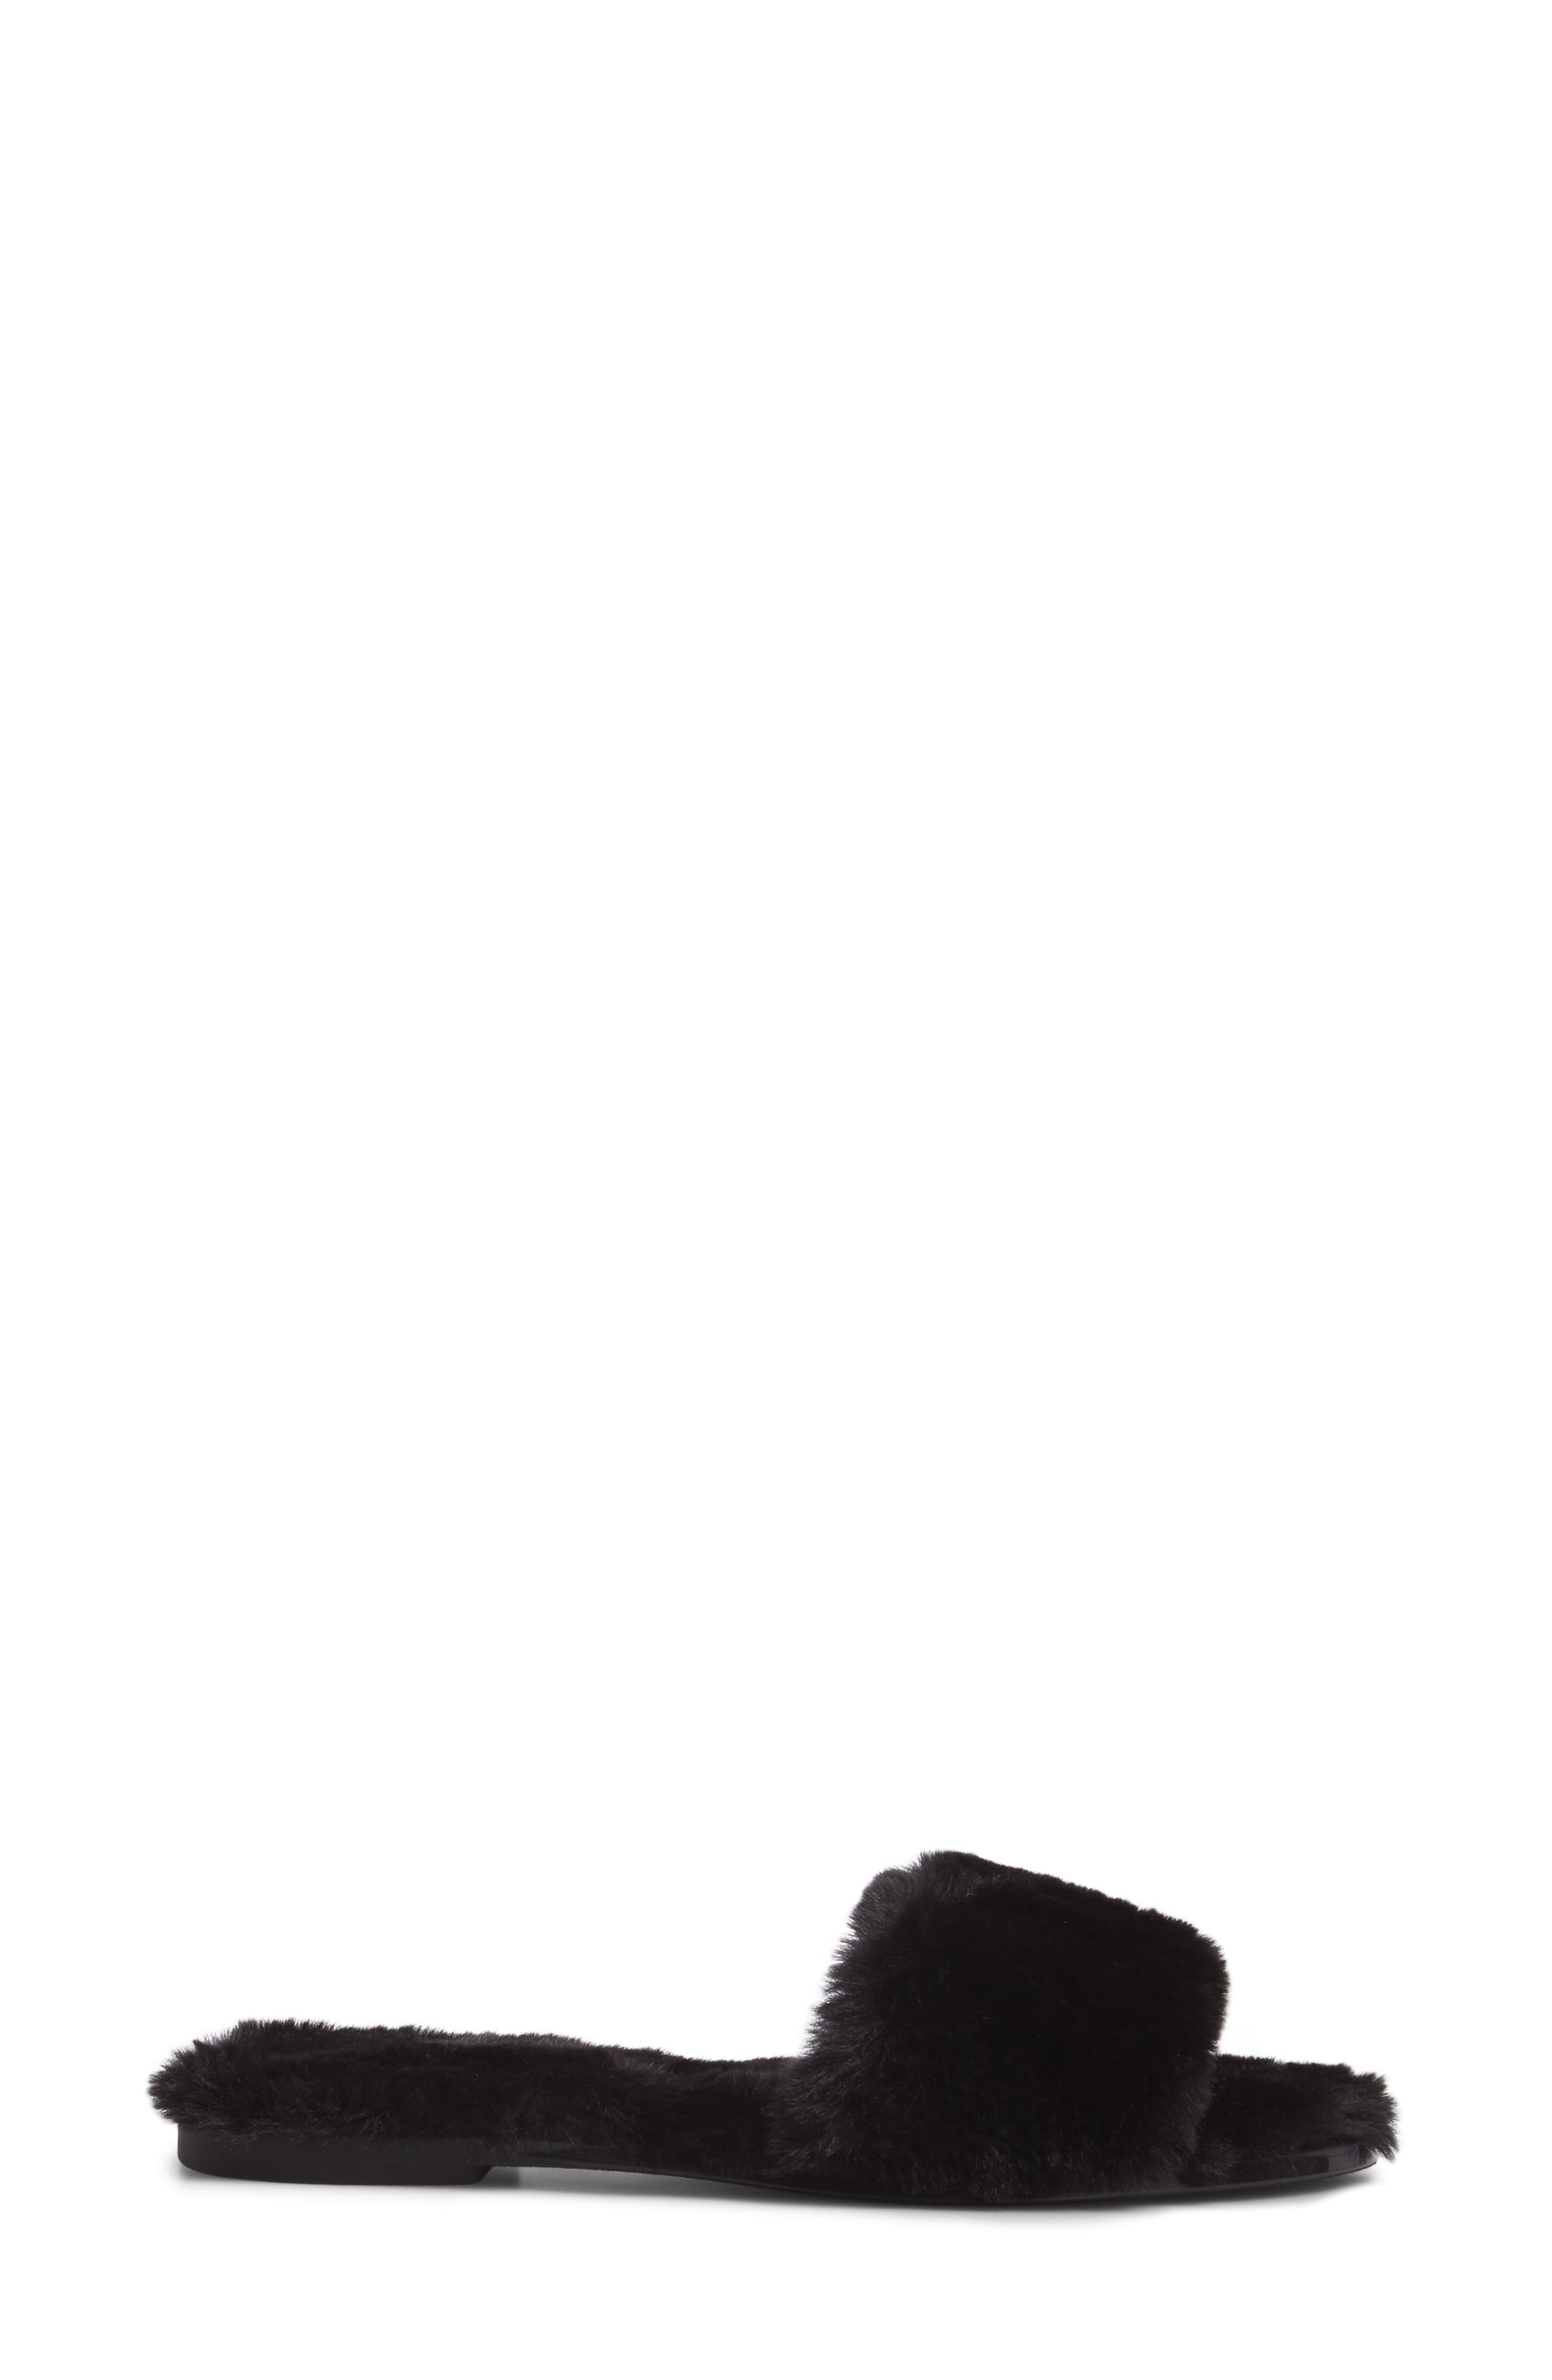 Mulholland Faux Fur Slide Sandal,                             Alternate thumbnail 3, color,                             001